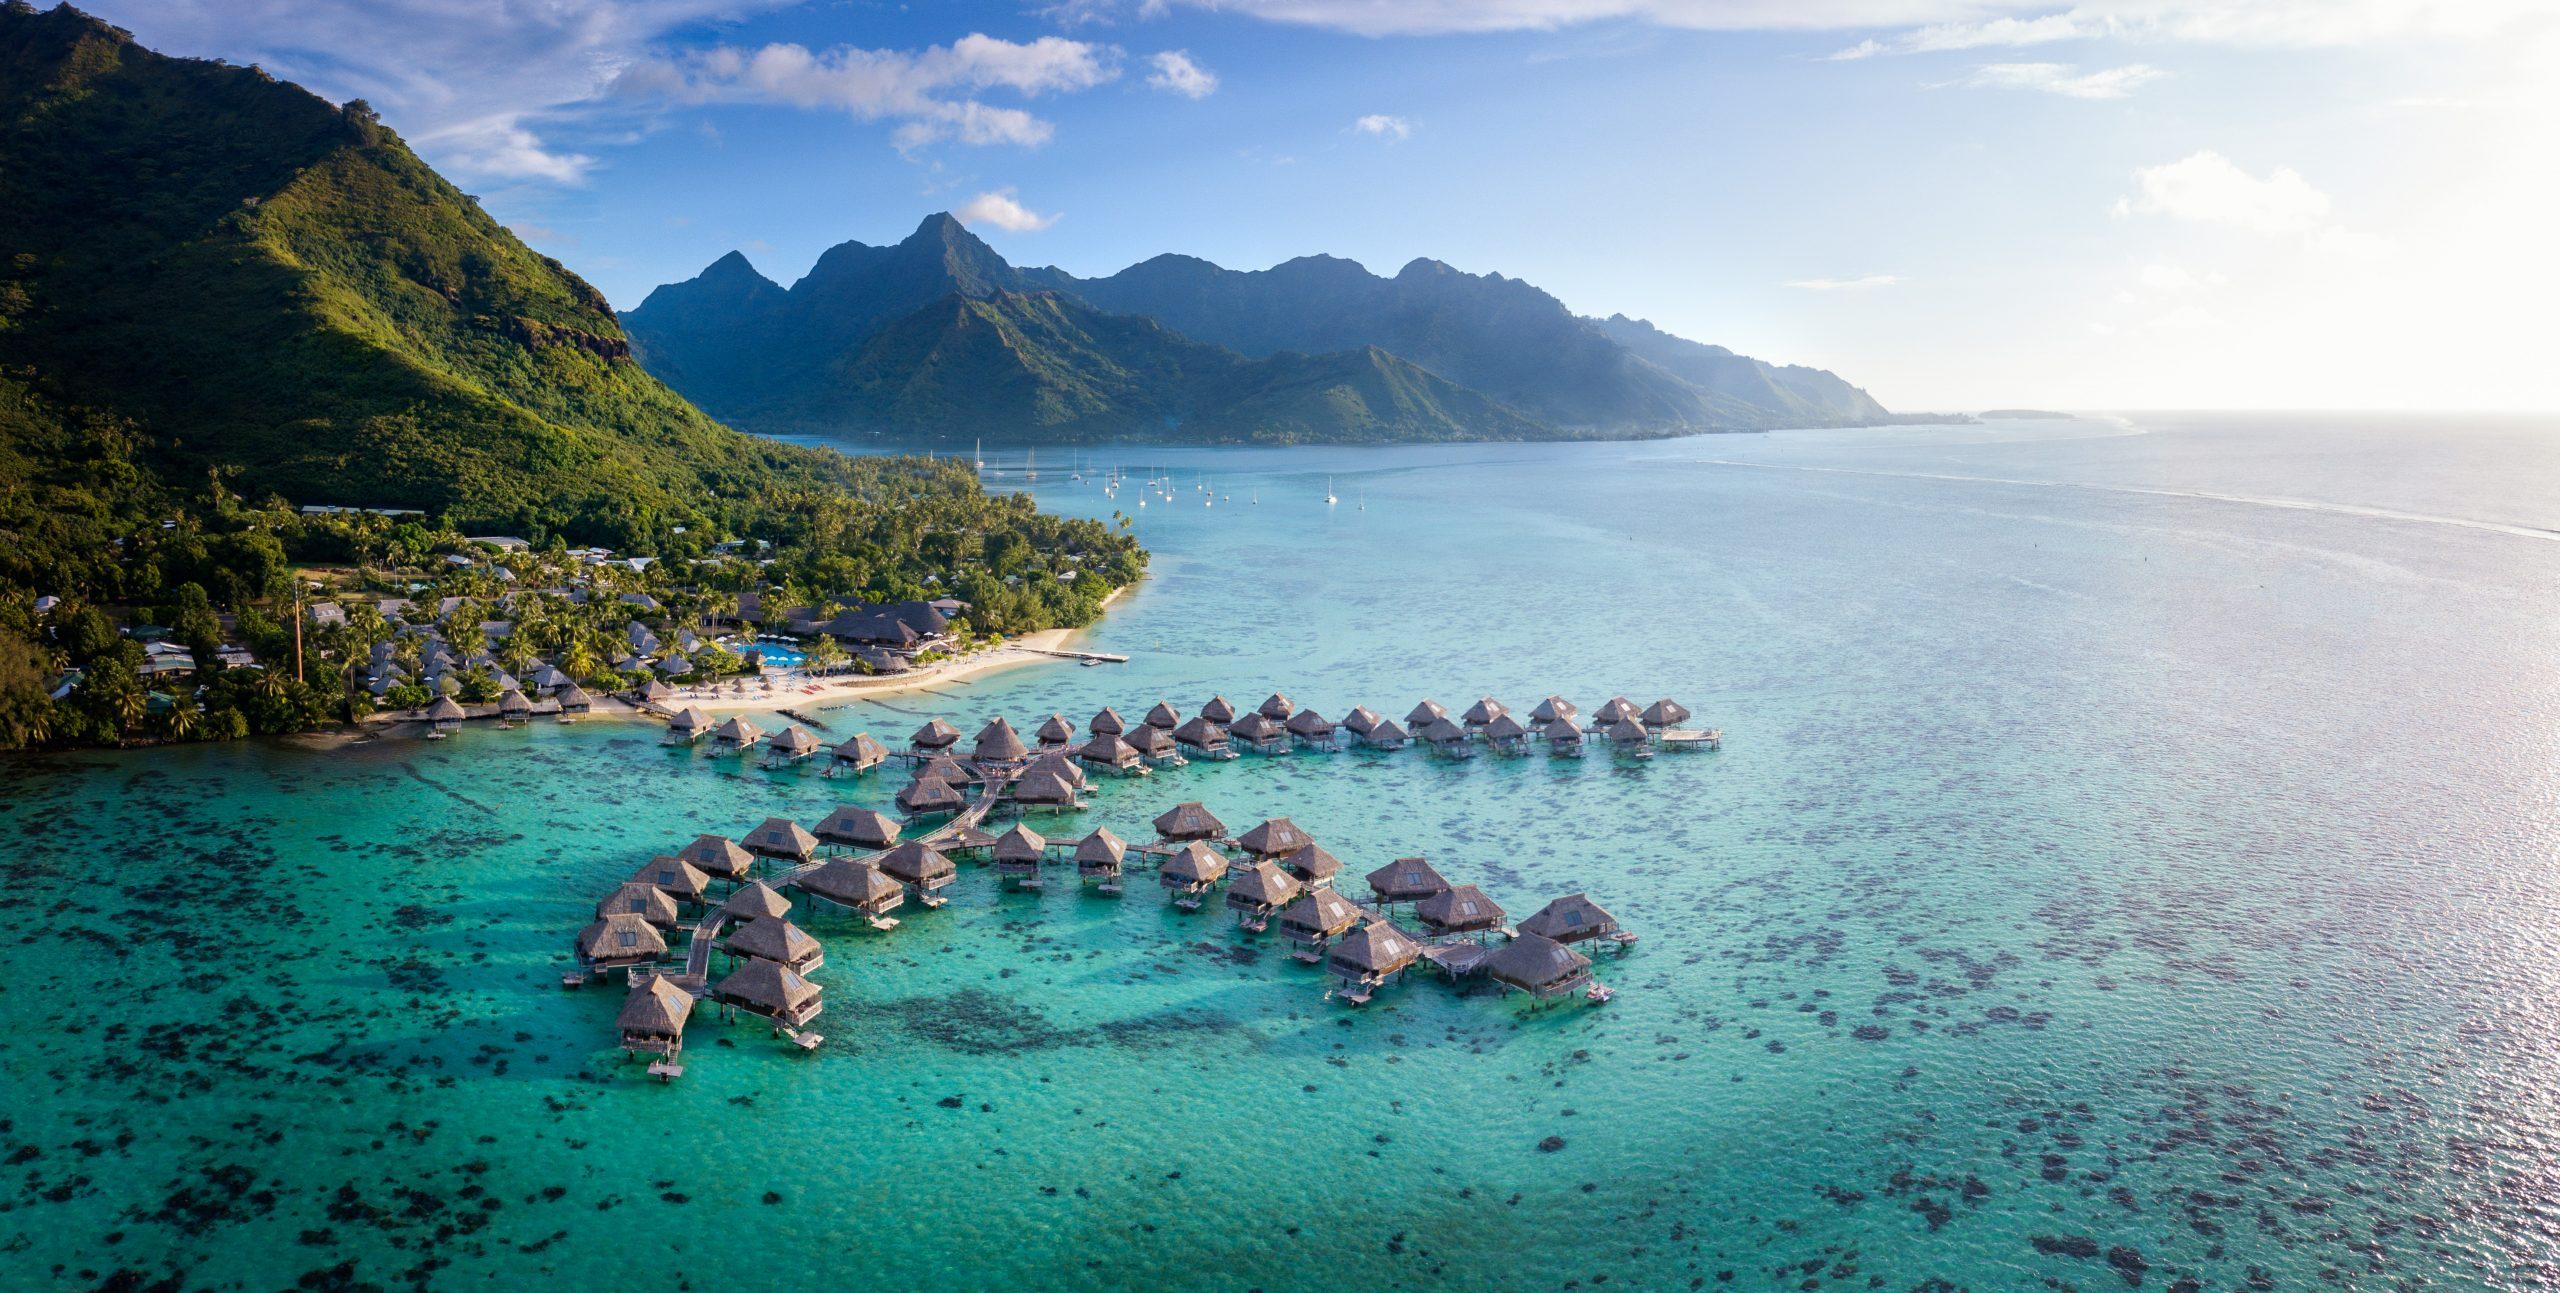 https://tahititourisme.com/wp-content/uploads/2021/05/01-HMLR-Resort-view-scaled.jpg